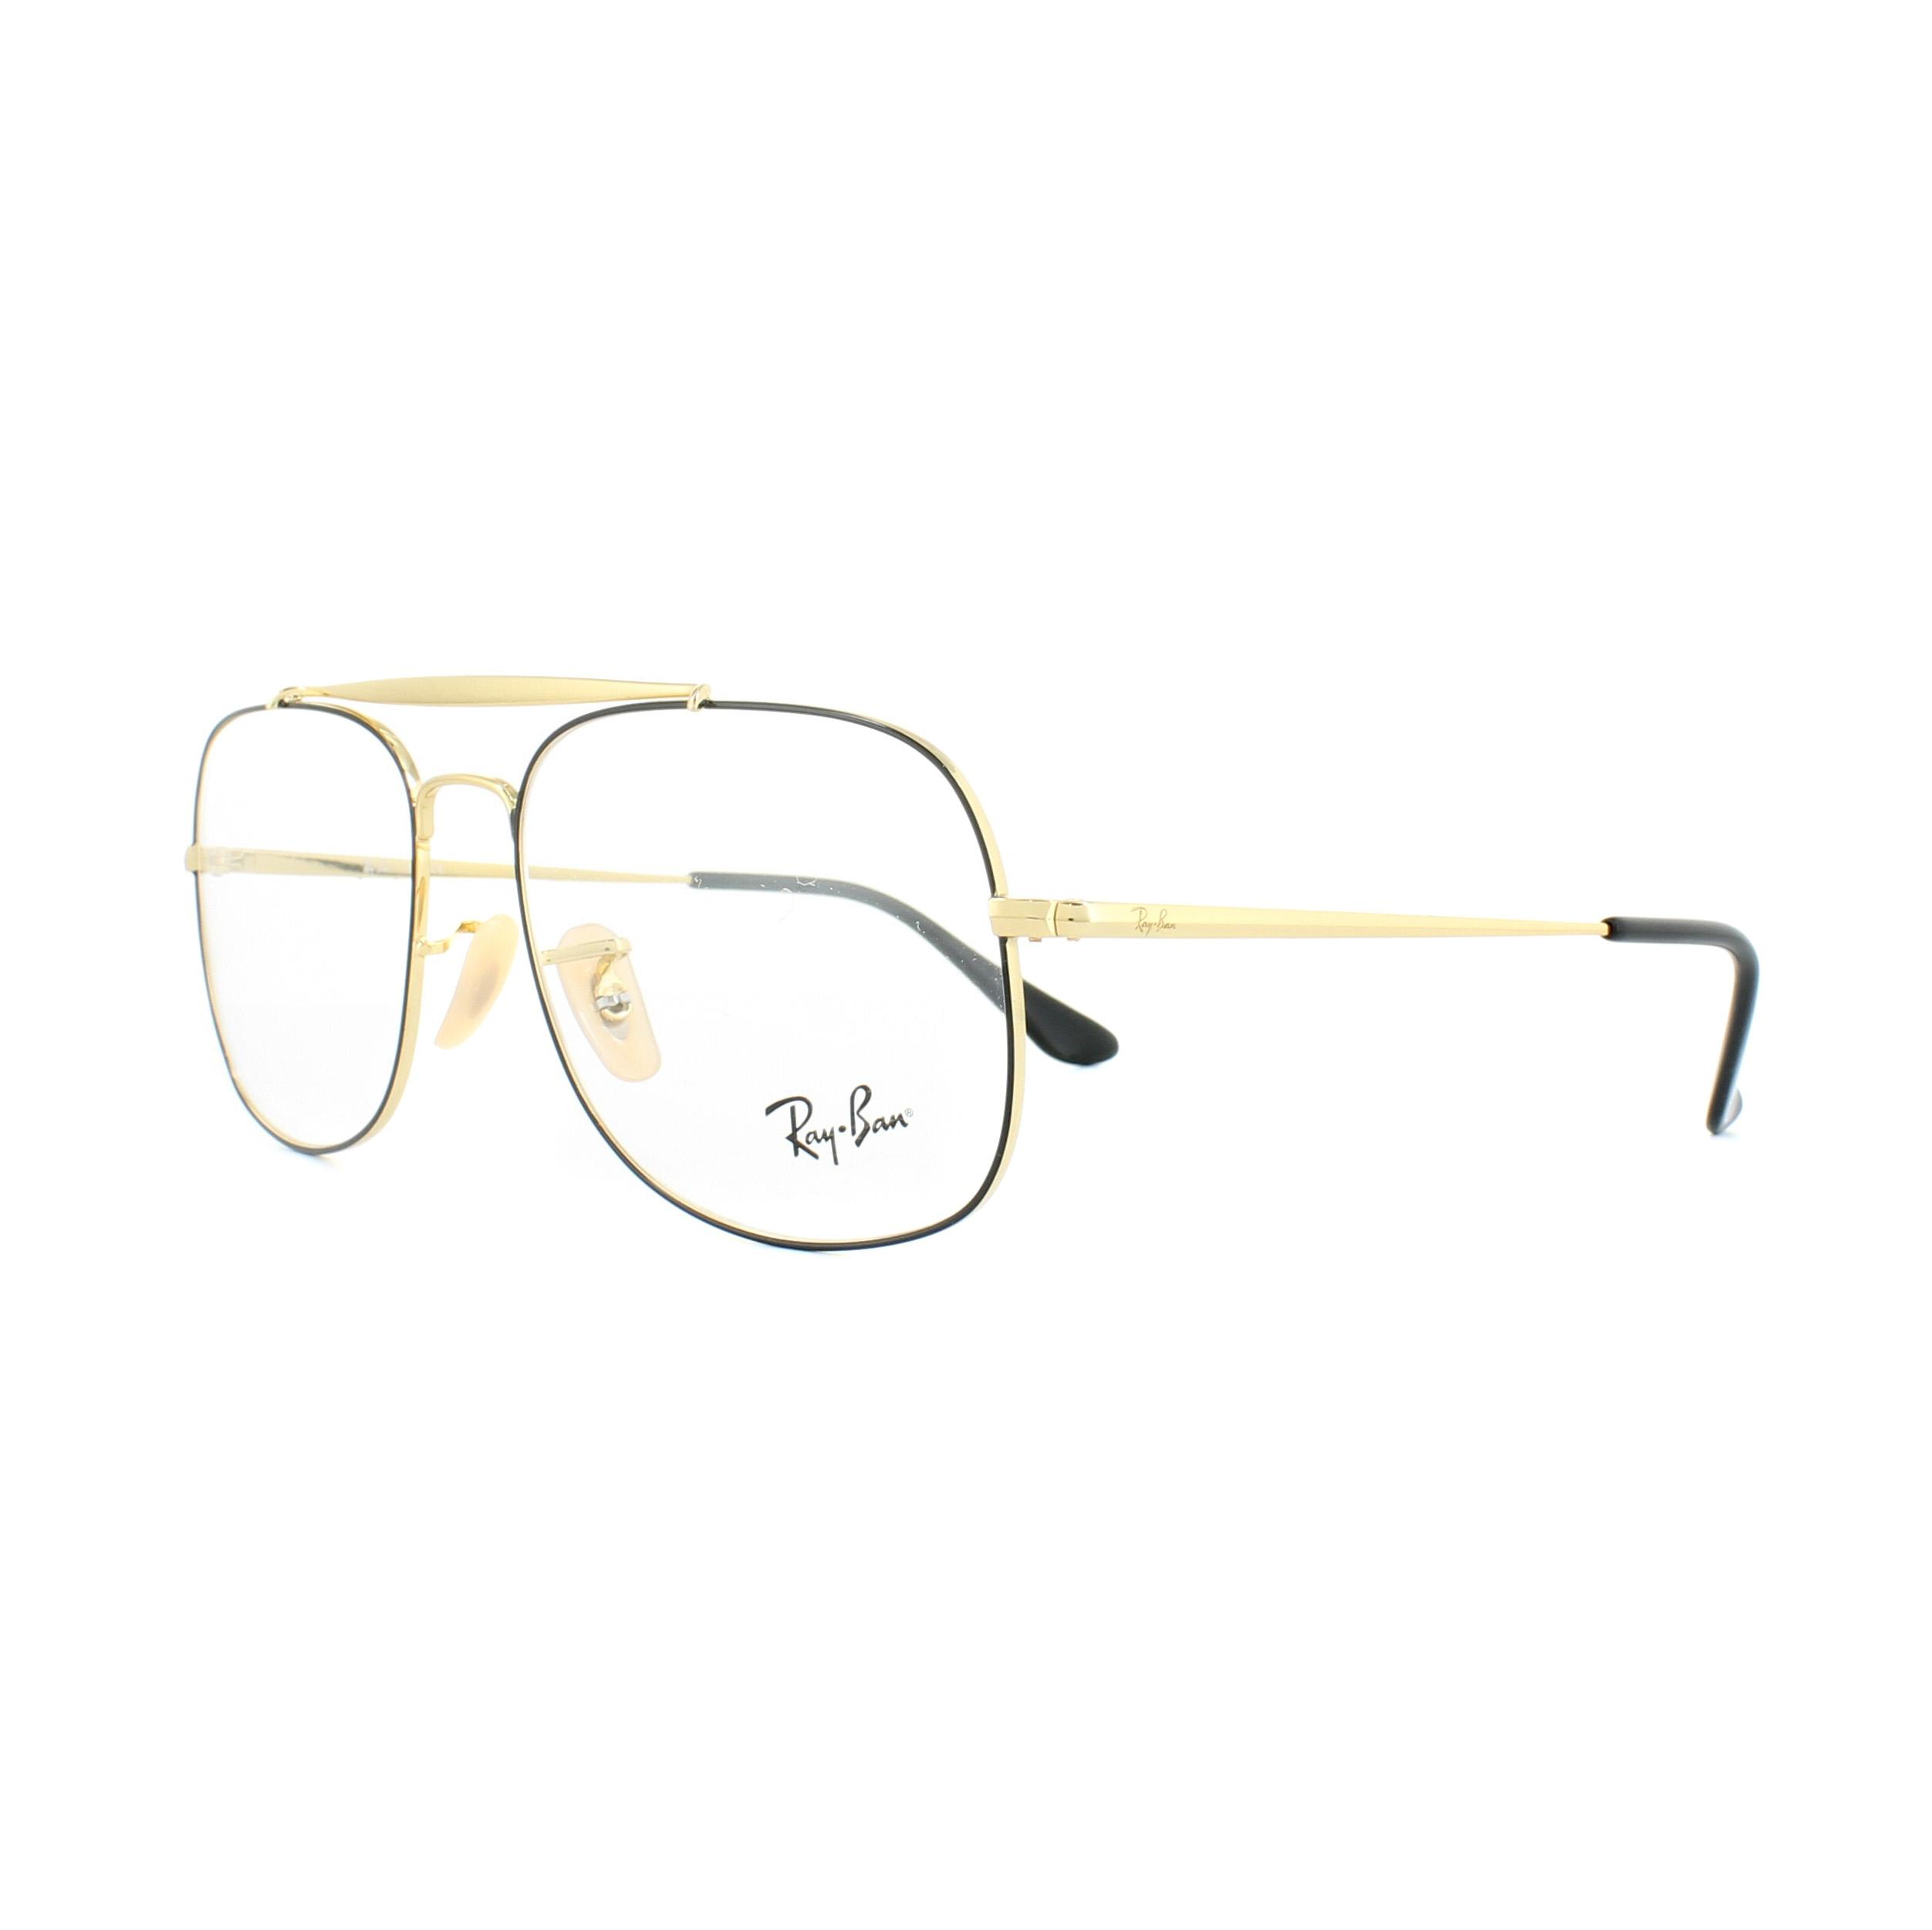 Ray-Ban Glasses Frames 6389 The General 2946 Black Gold 55mm Mens ...